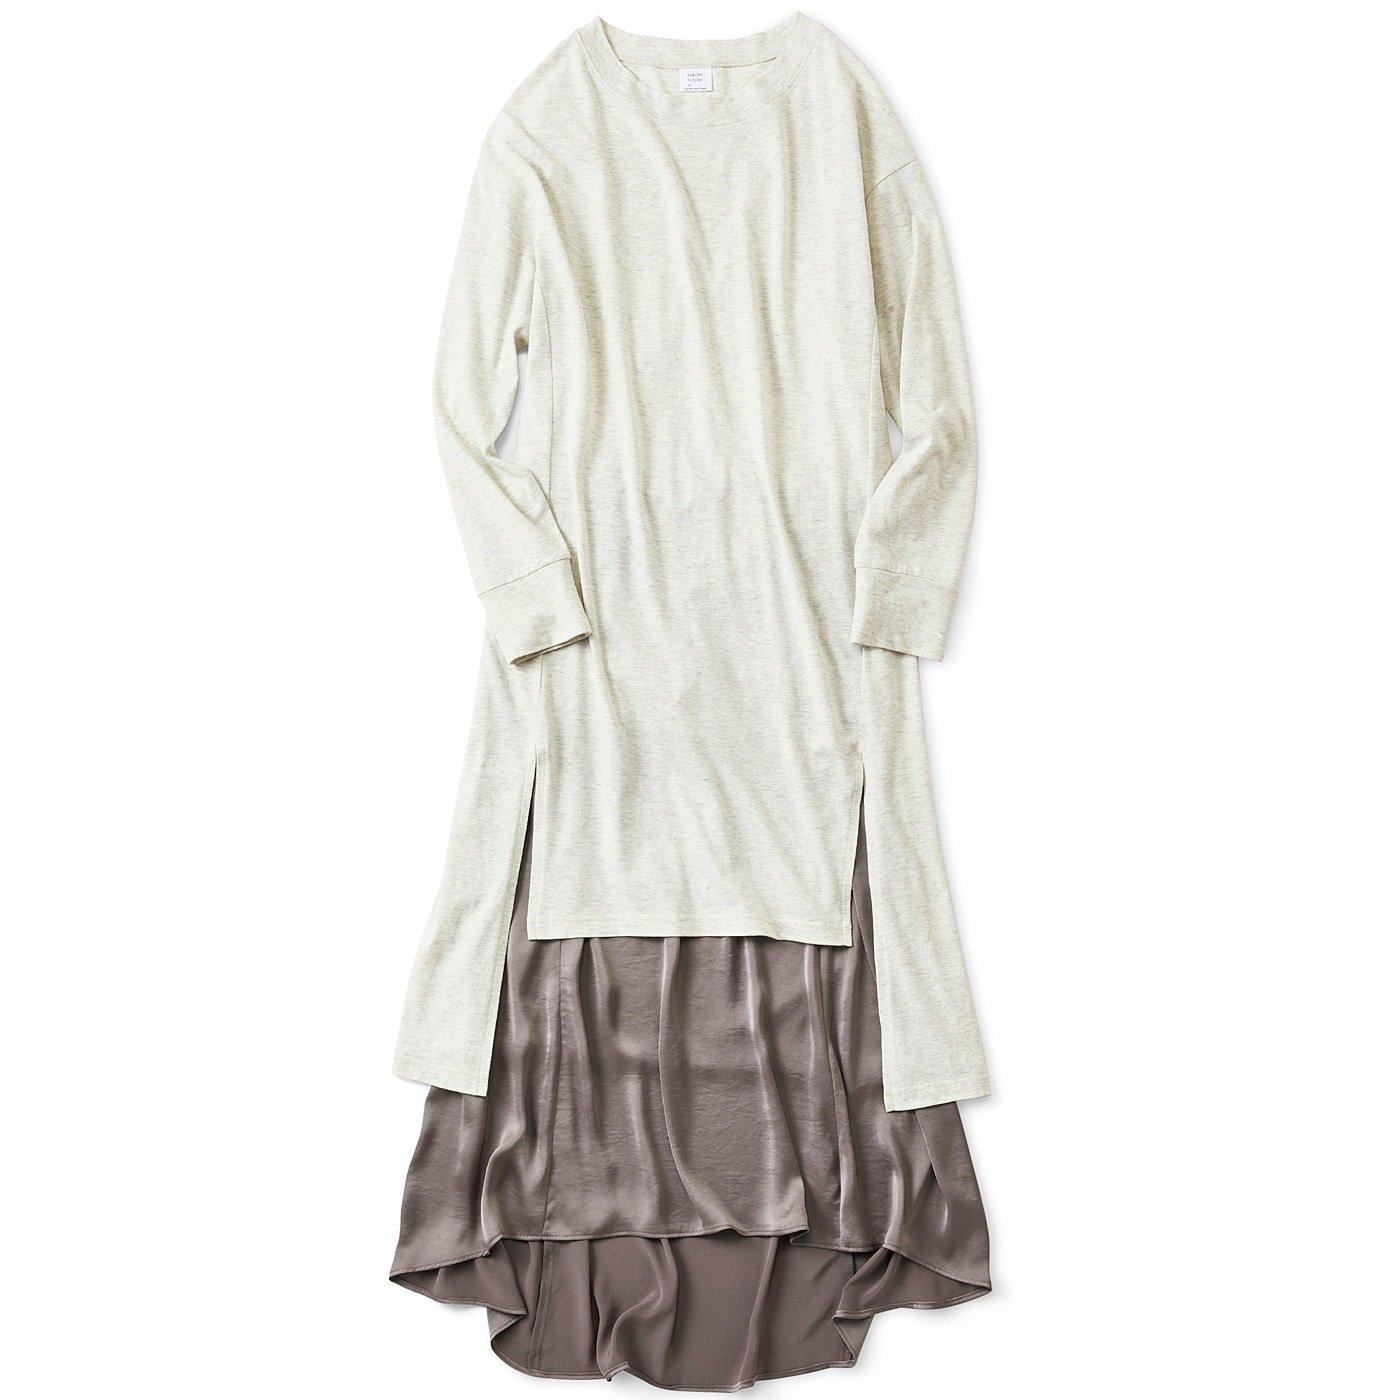 HIROMI YOSHIDA. サテンスカートとチュニックのセットアップ